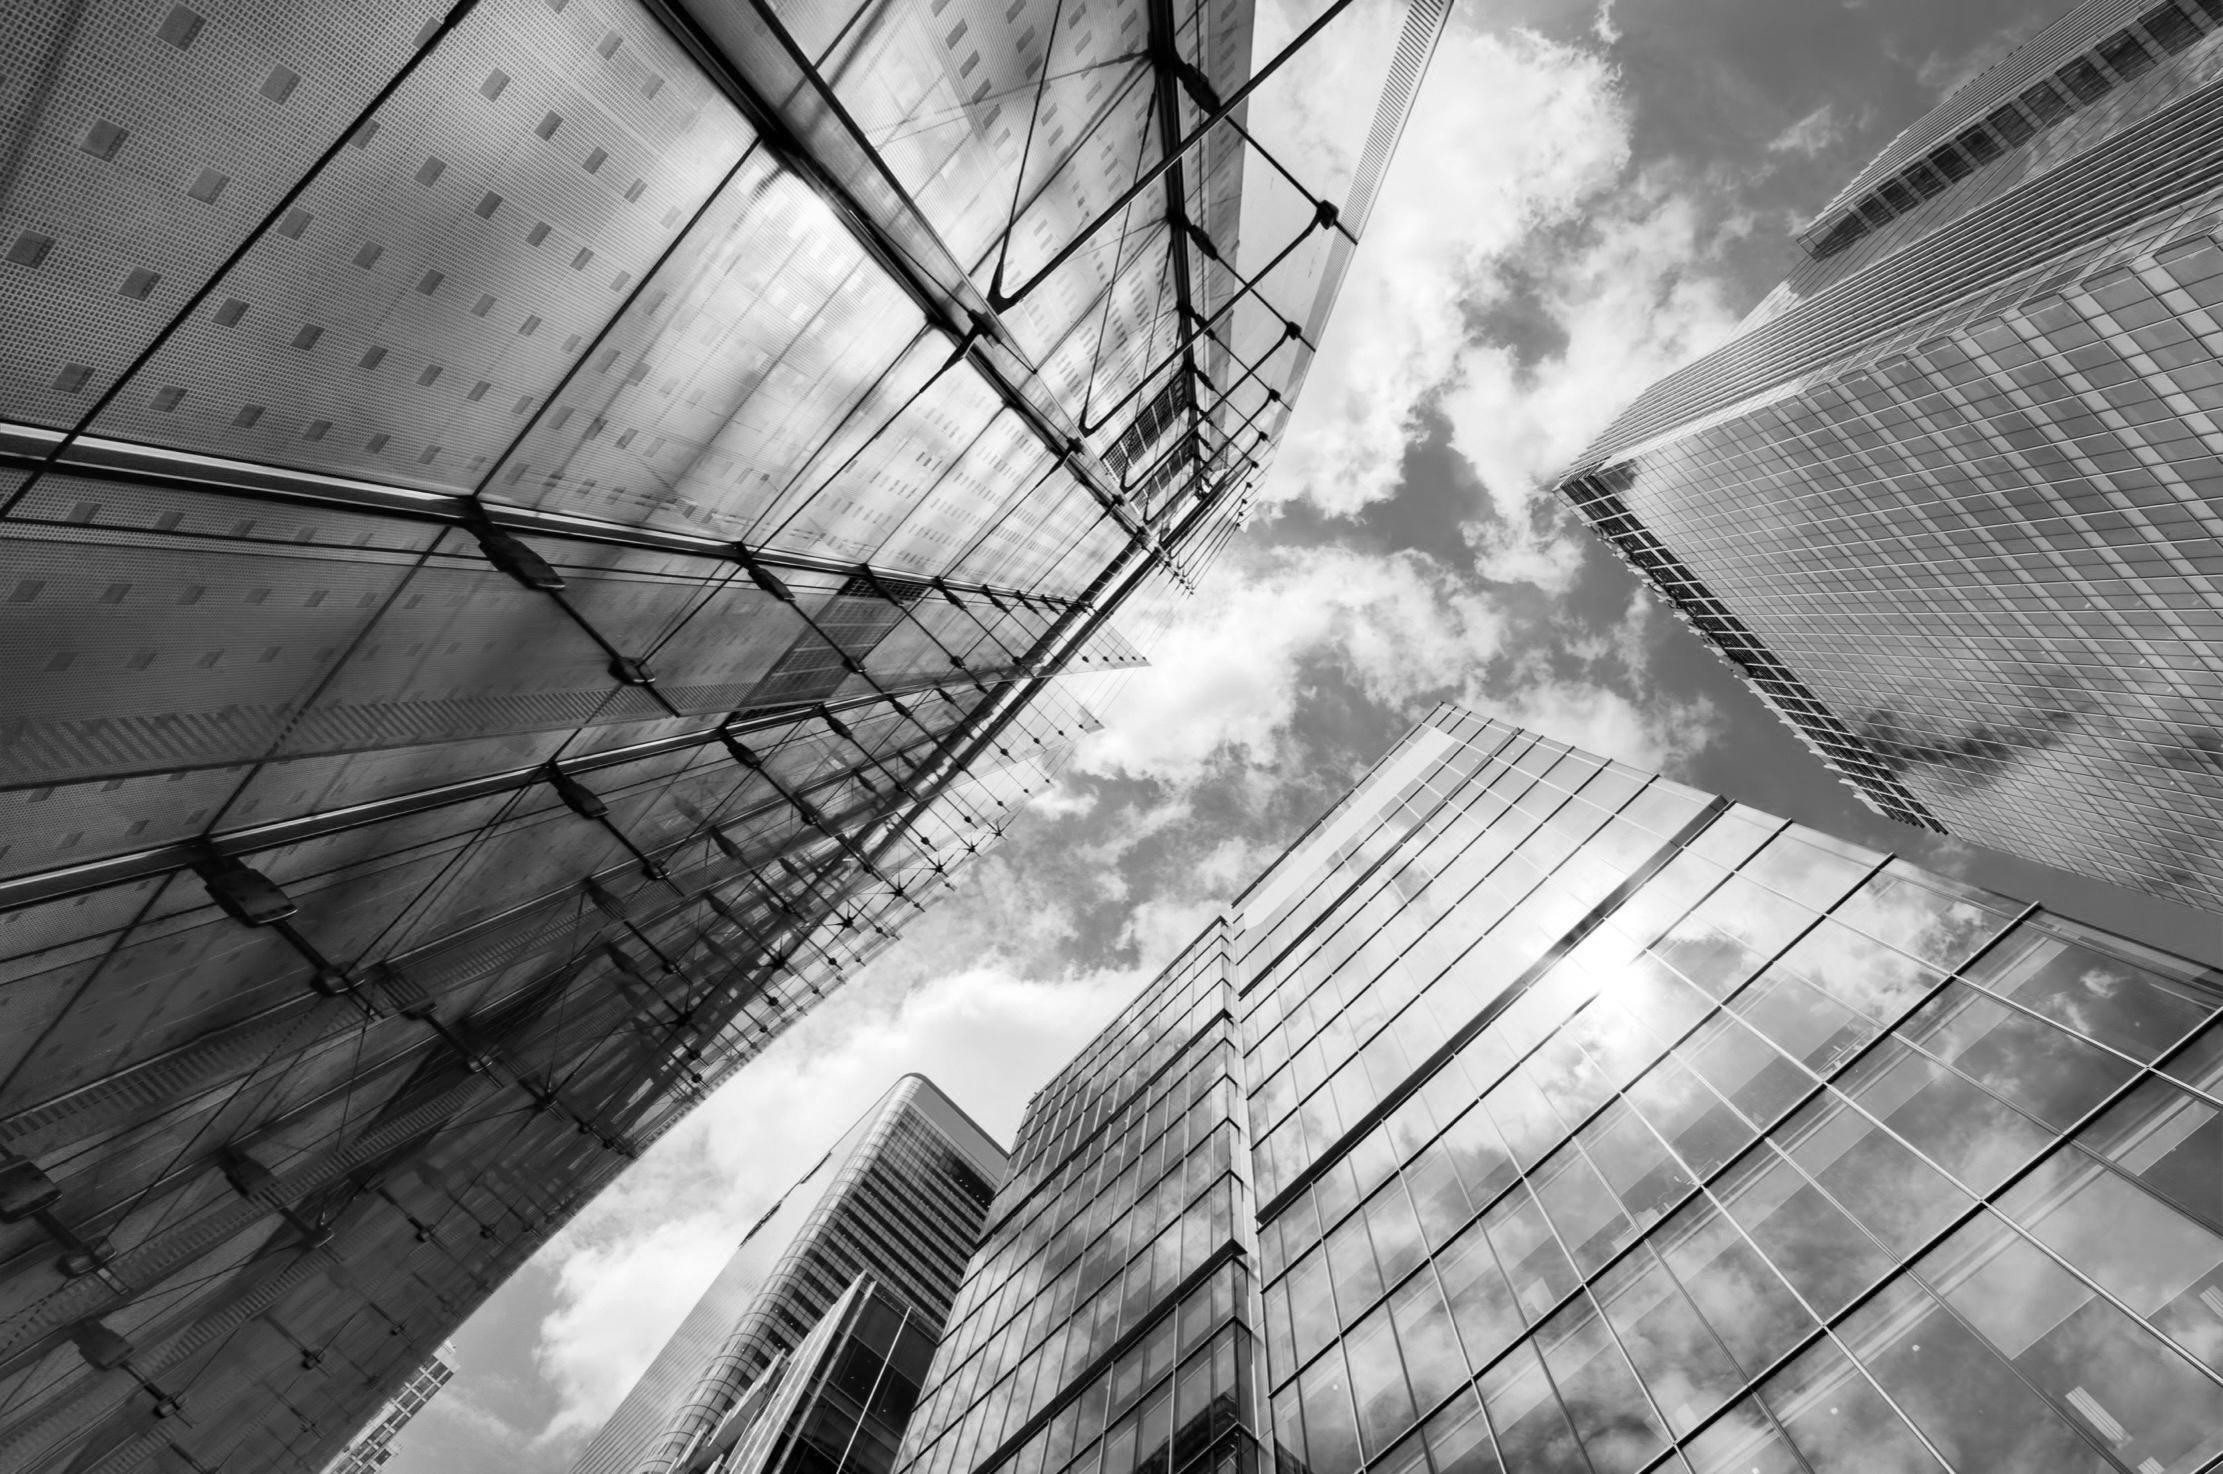 bigstock-Common-modern-business-skyscra-96067433.jpg